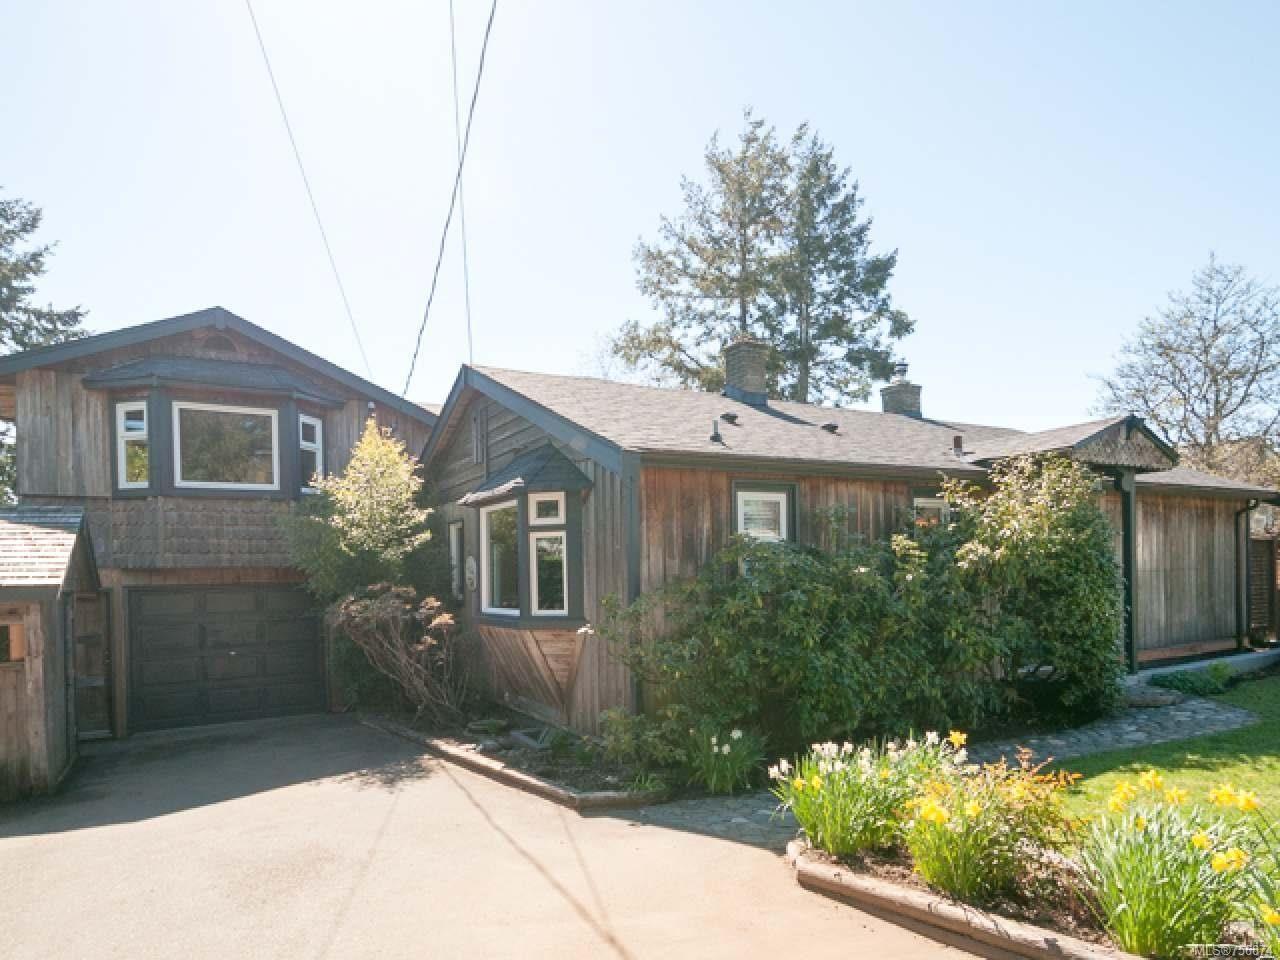 Main Photo: 1911 Comox Ave in COMOX: CV Comox (Town of) House for sale (Comox Valley)  : MLS®# 756874